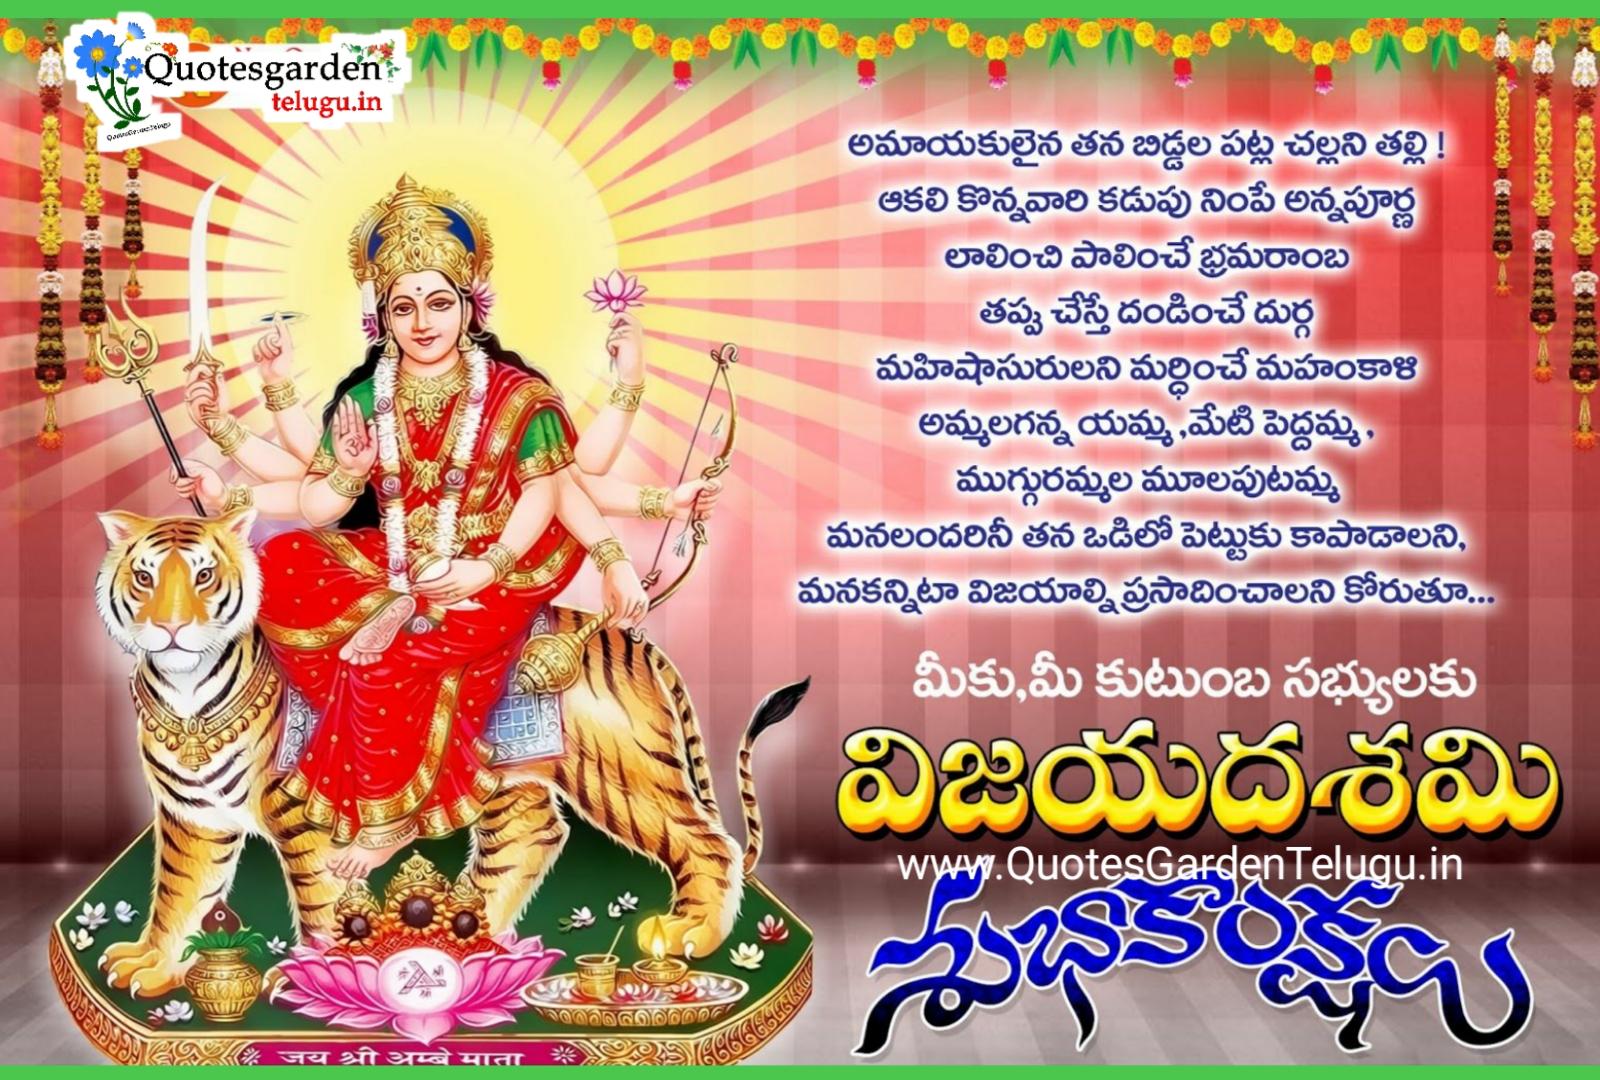 Happy Dussehra 2021 greetings best Vijayadashami  wishes images messages in telugu language free download